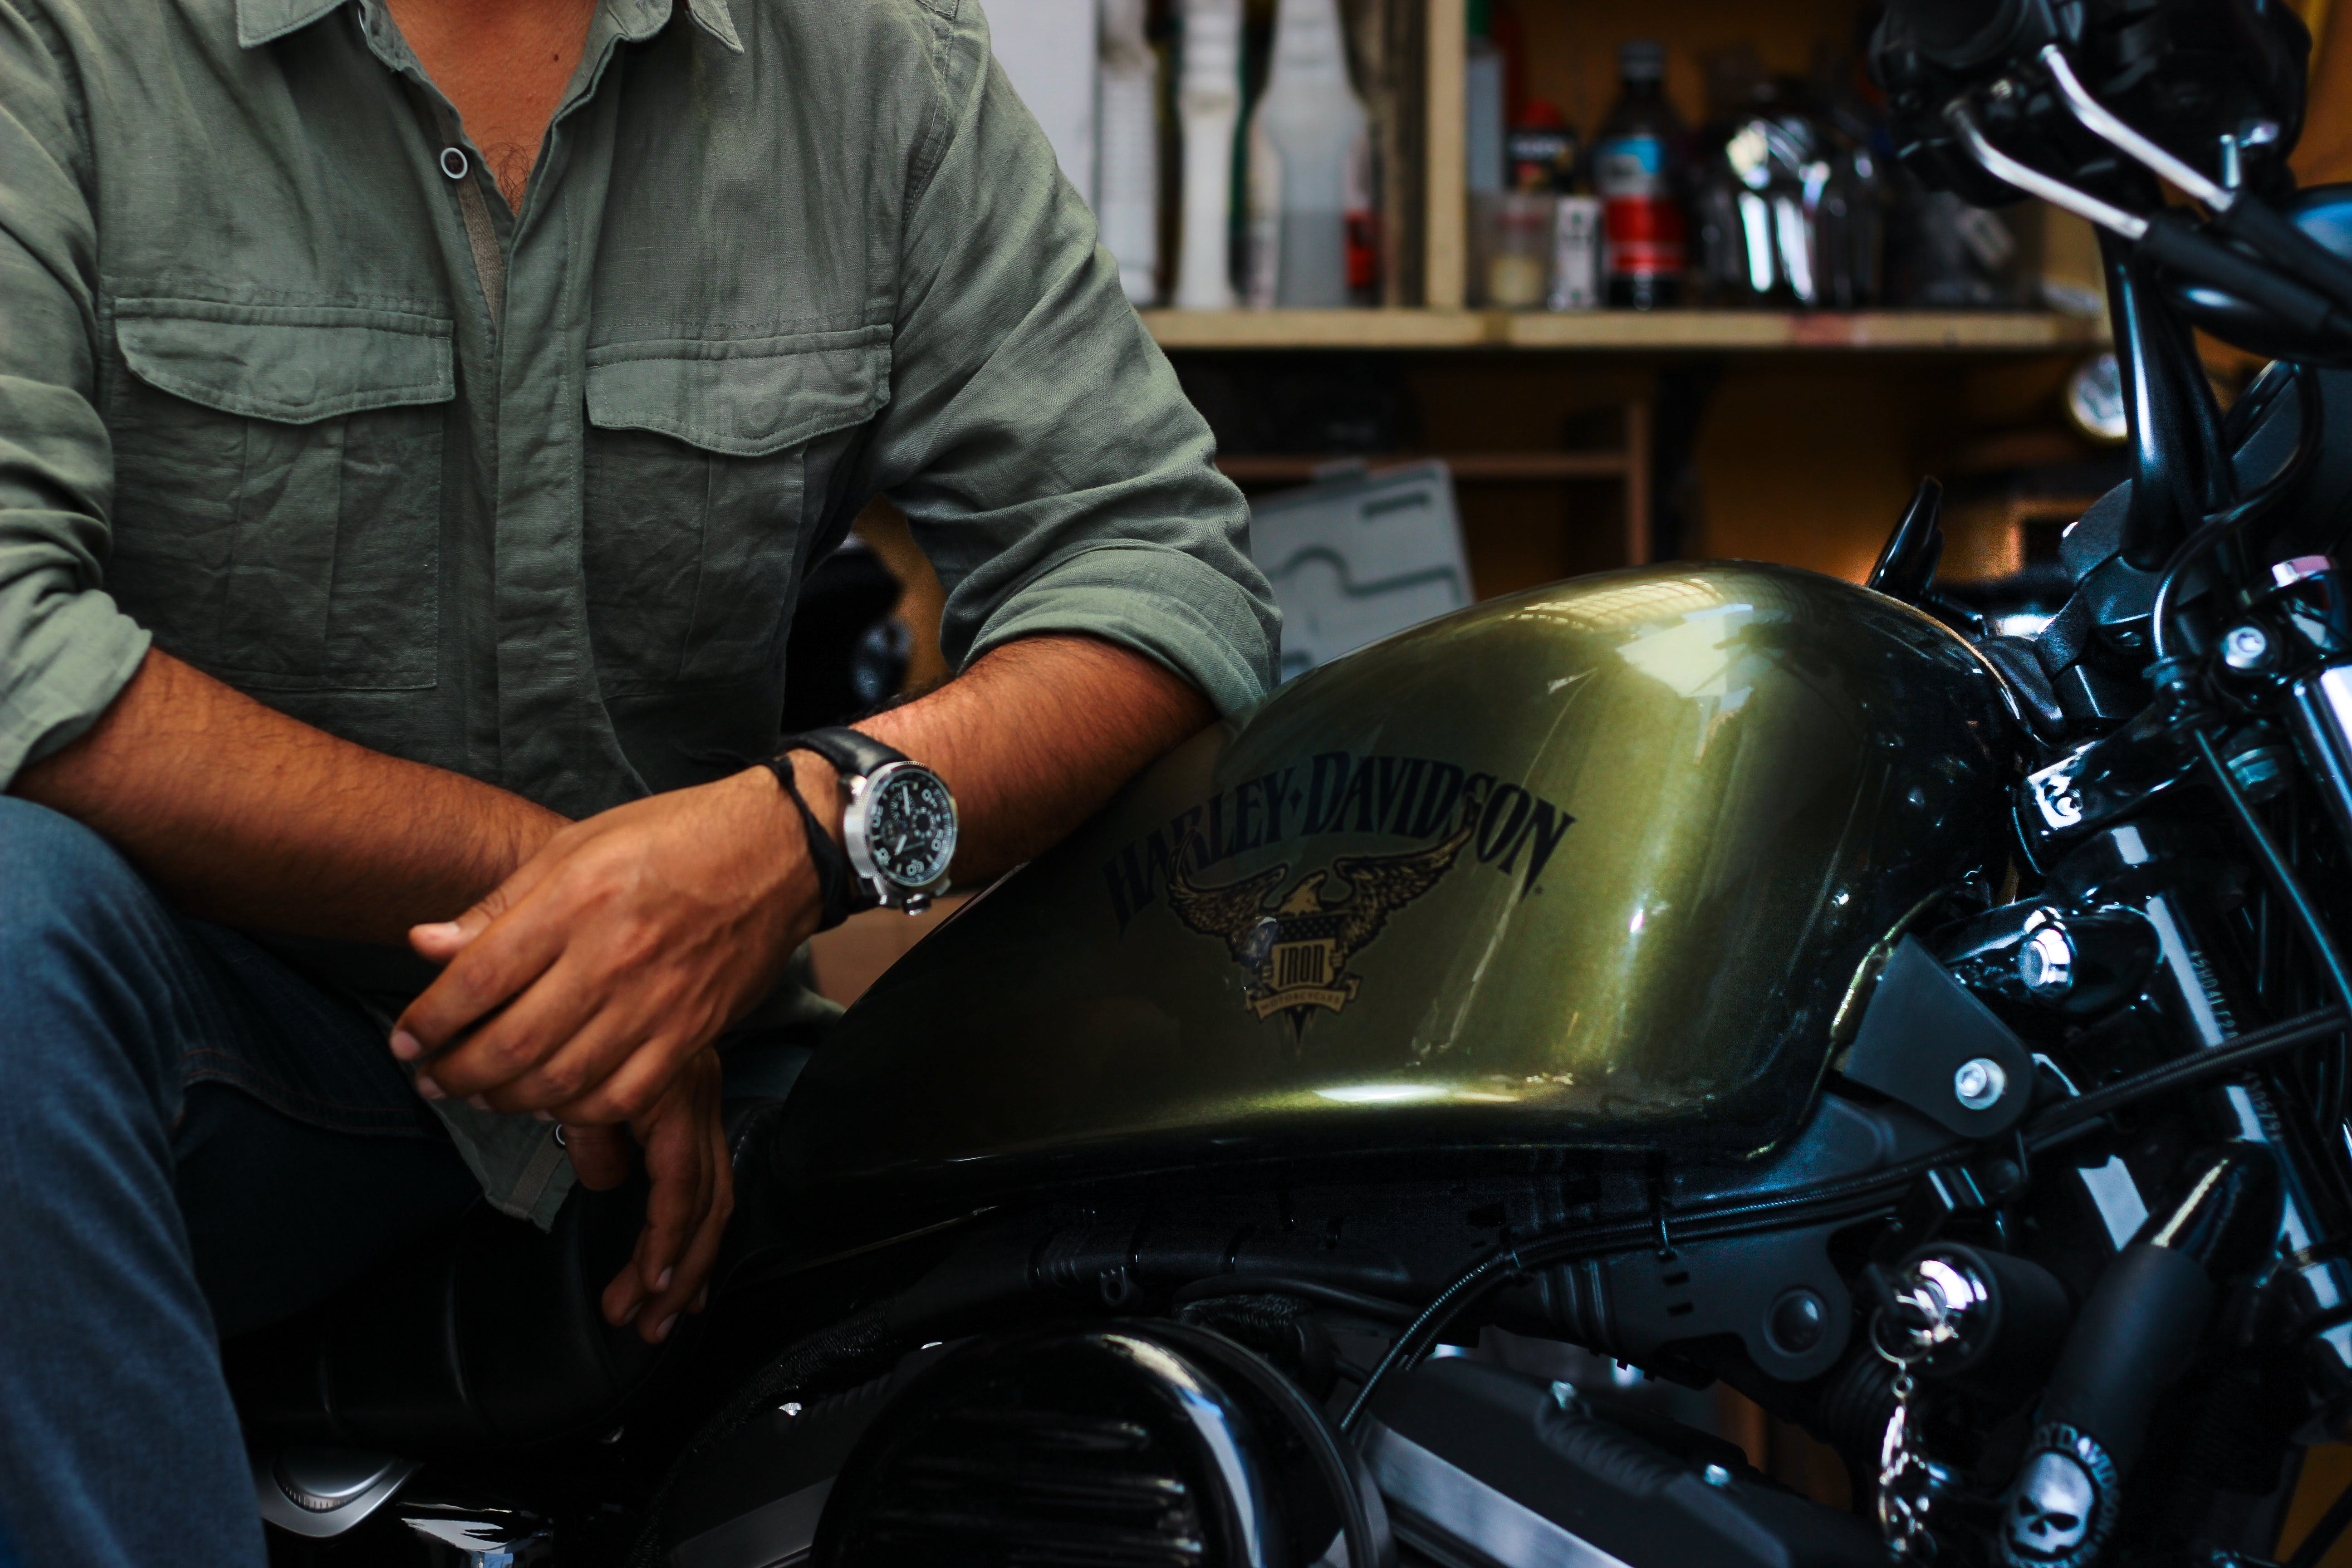 Gold and Silver Harley-davidson Motorcycle